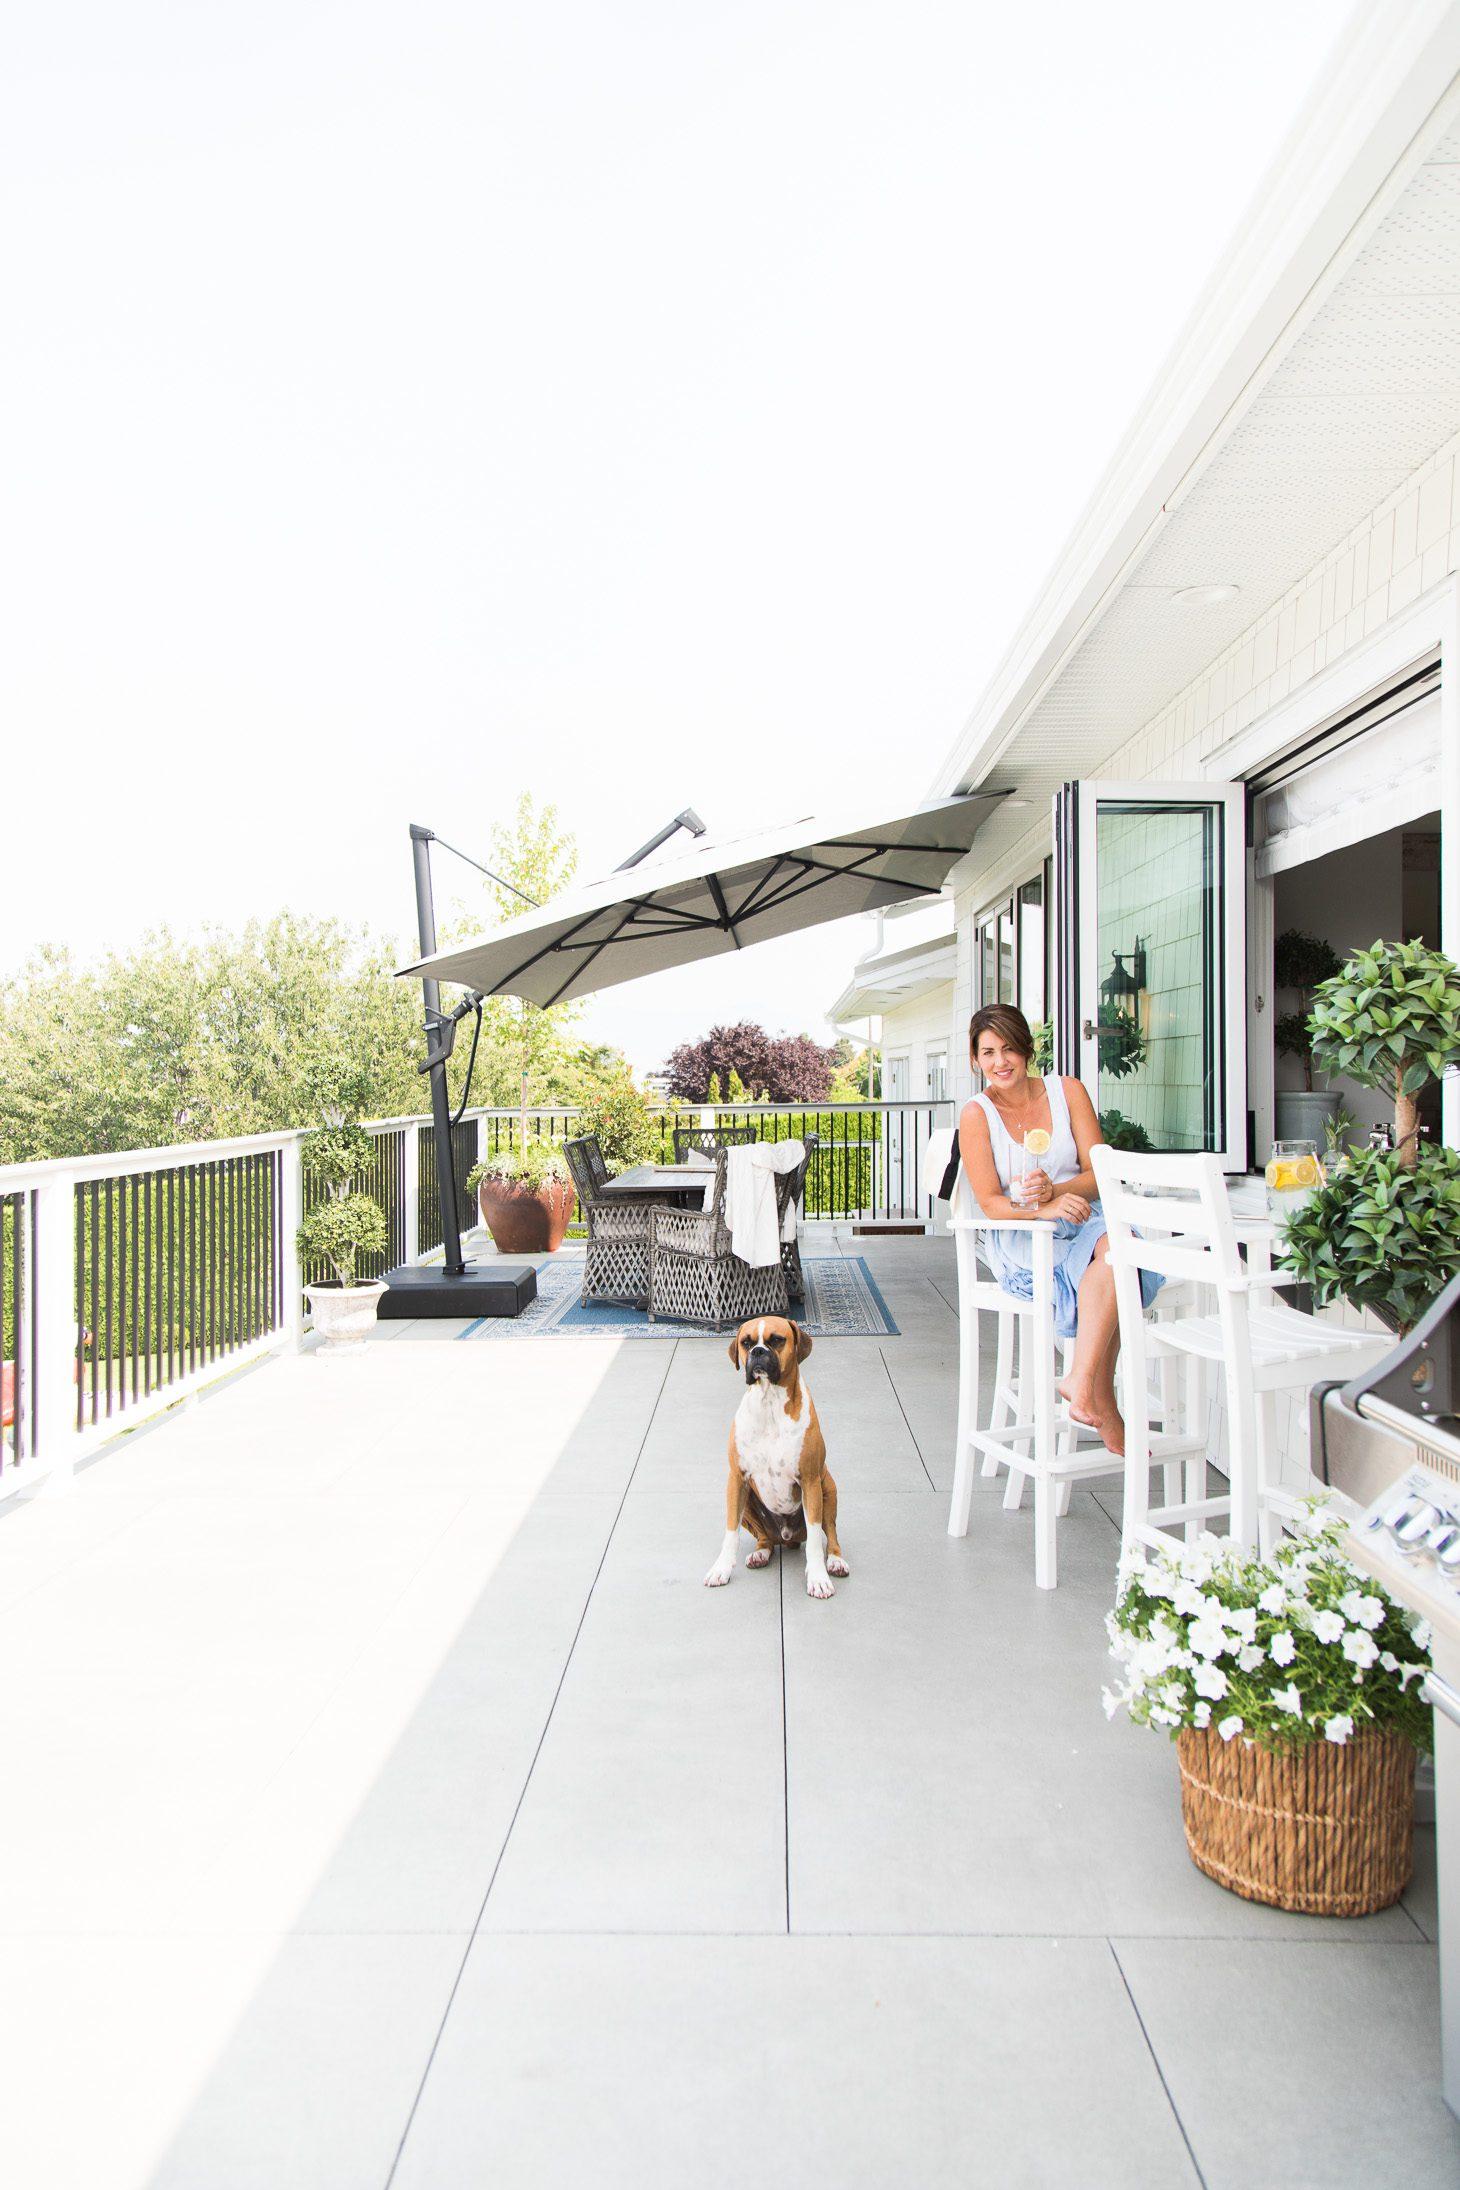 Jillian Harris Home Renovation Series: Our Deck Details